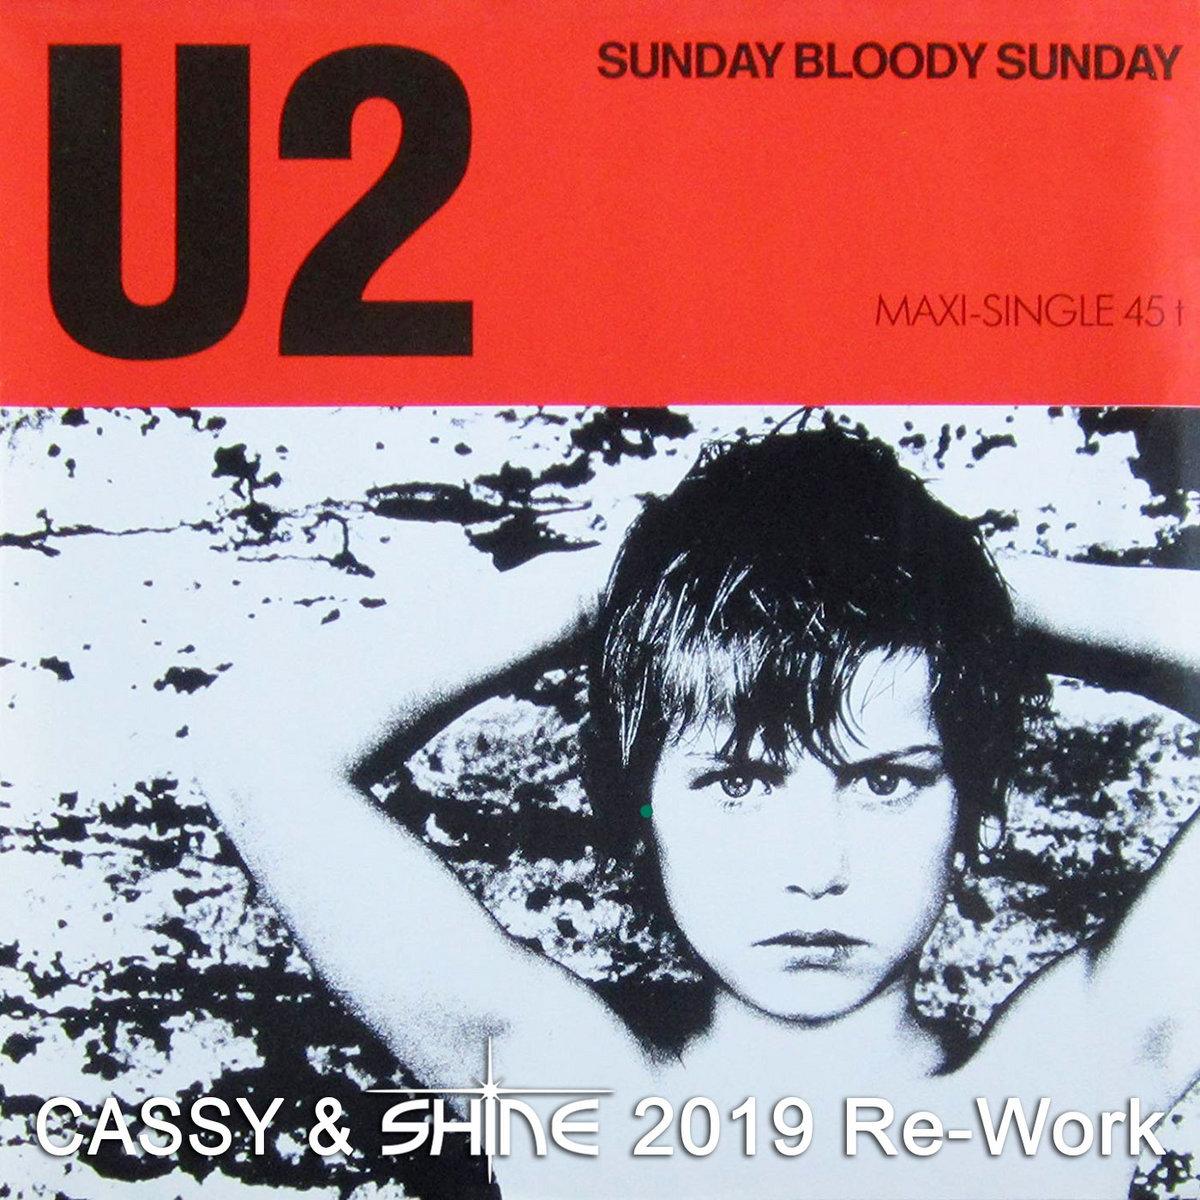 U2 - Sunday Bloody Sunday (Cassy & Shine Re-Work) | Cassy